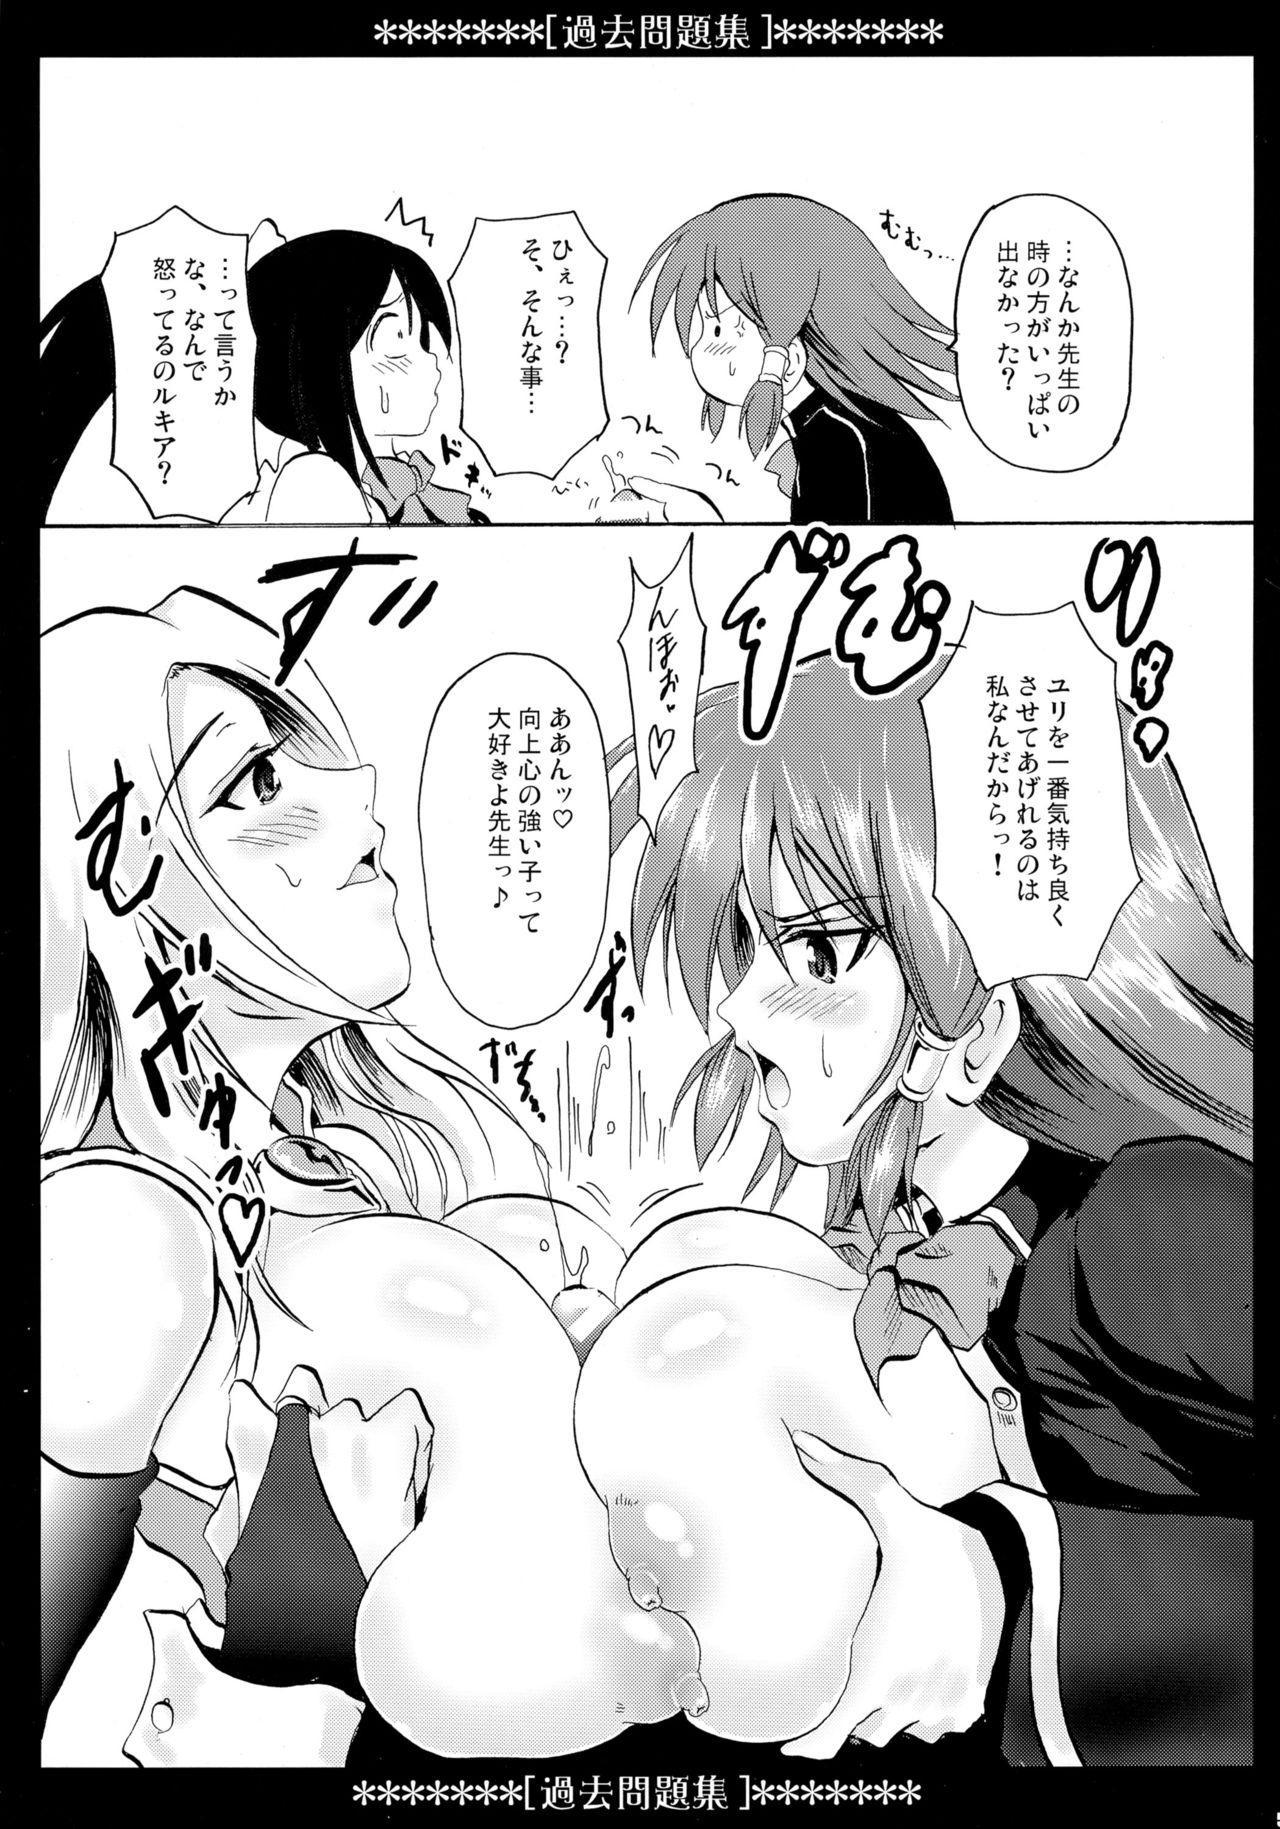 Kakomondai Shuu Soushuuhen + Alpha 58